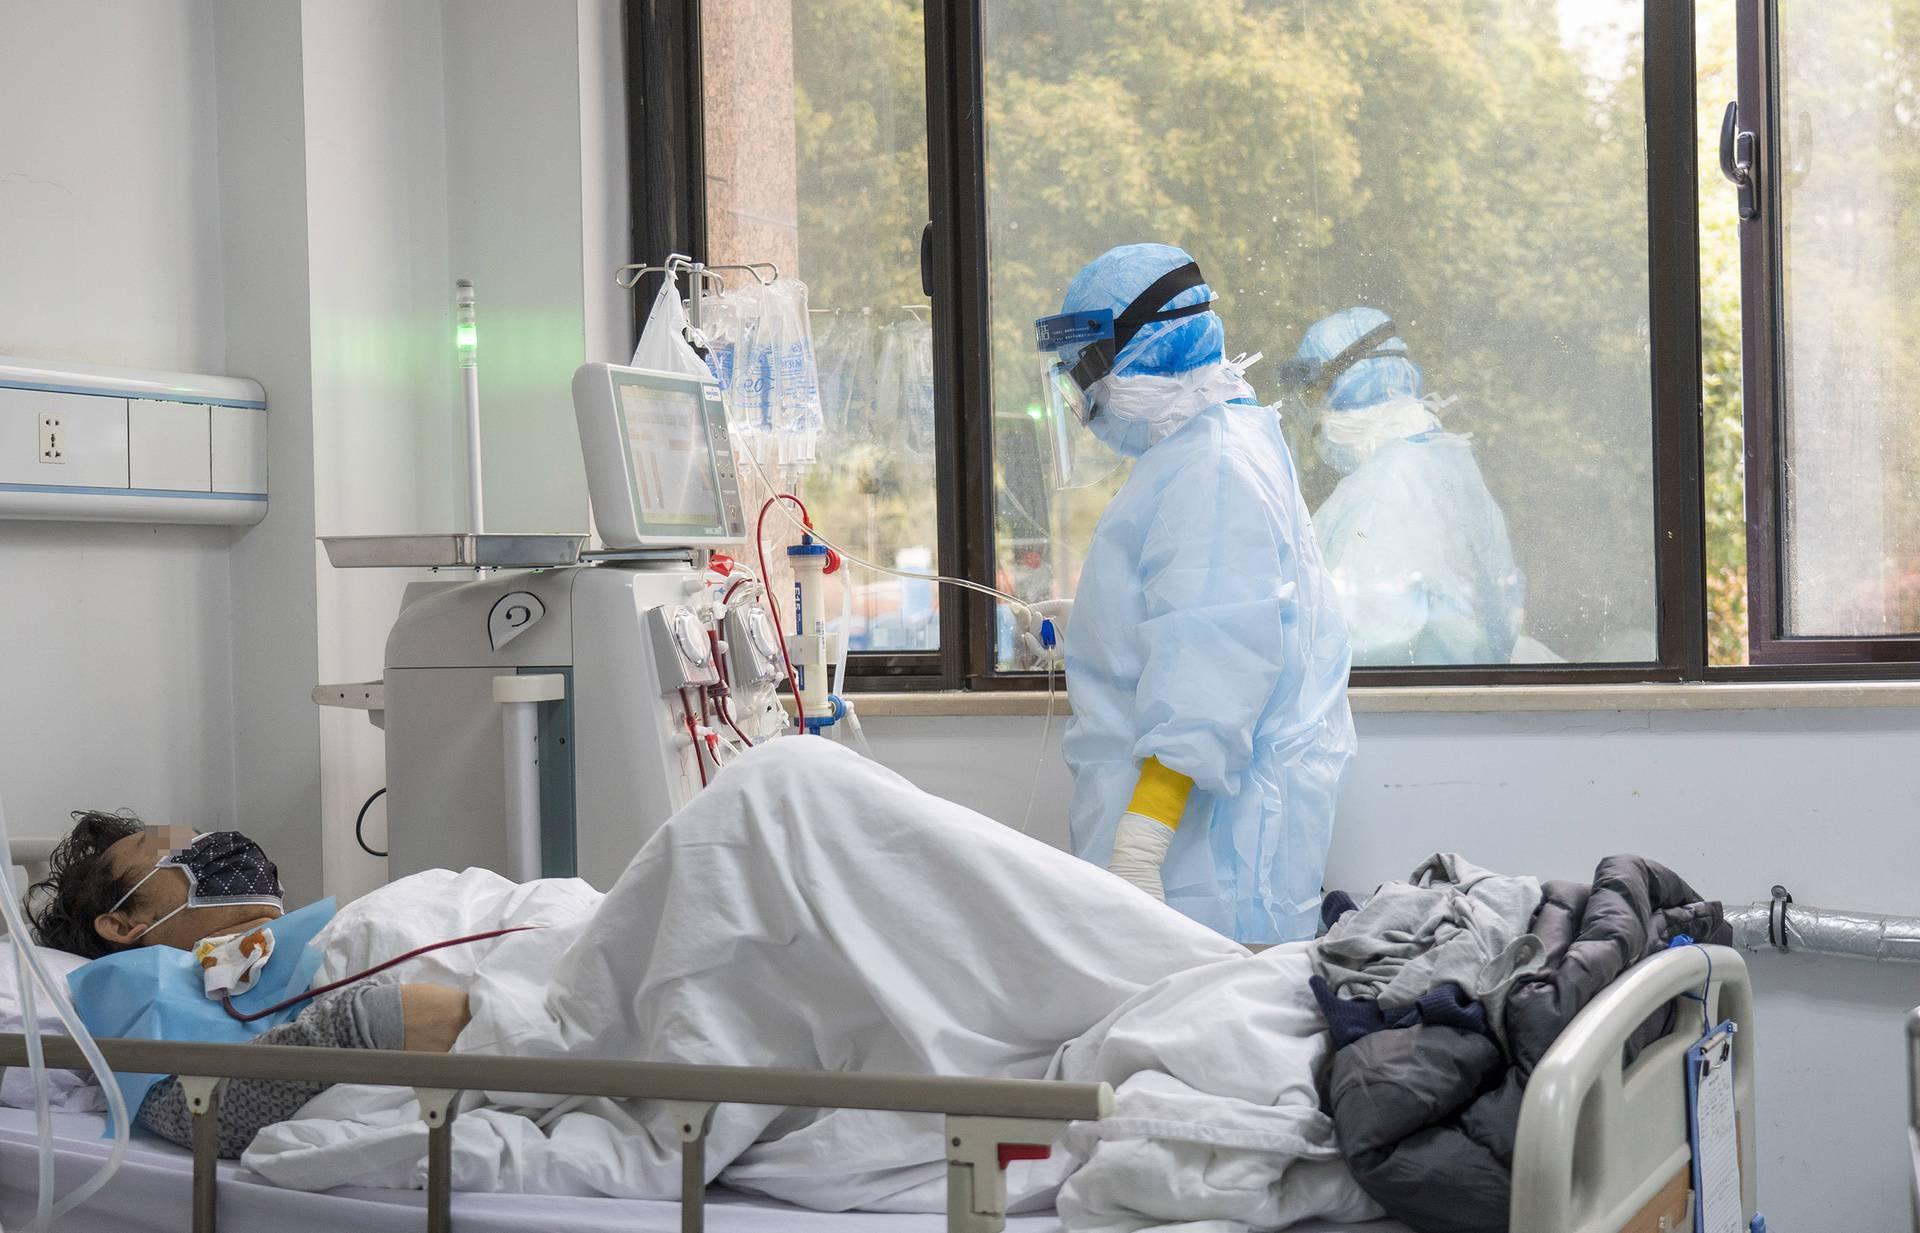 CHINA-HUBEI-WUHAN-MEDICS-HEMODIALYSIS (CN)